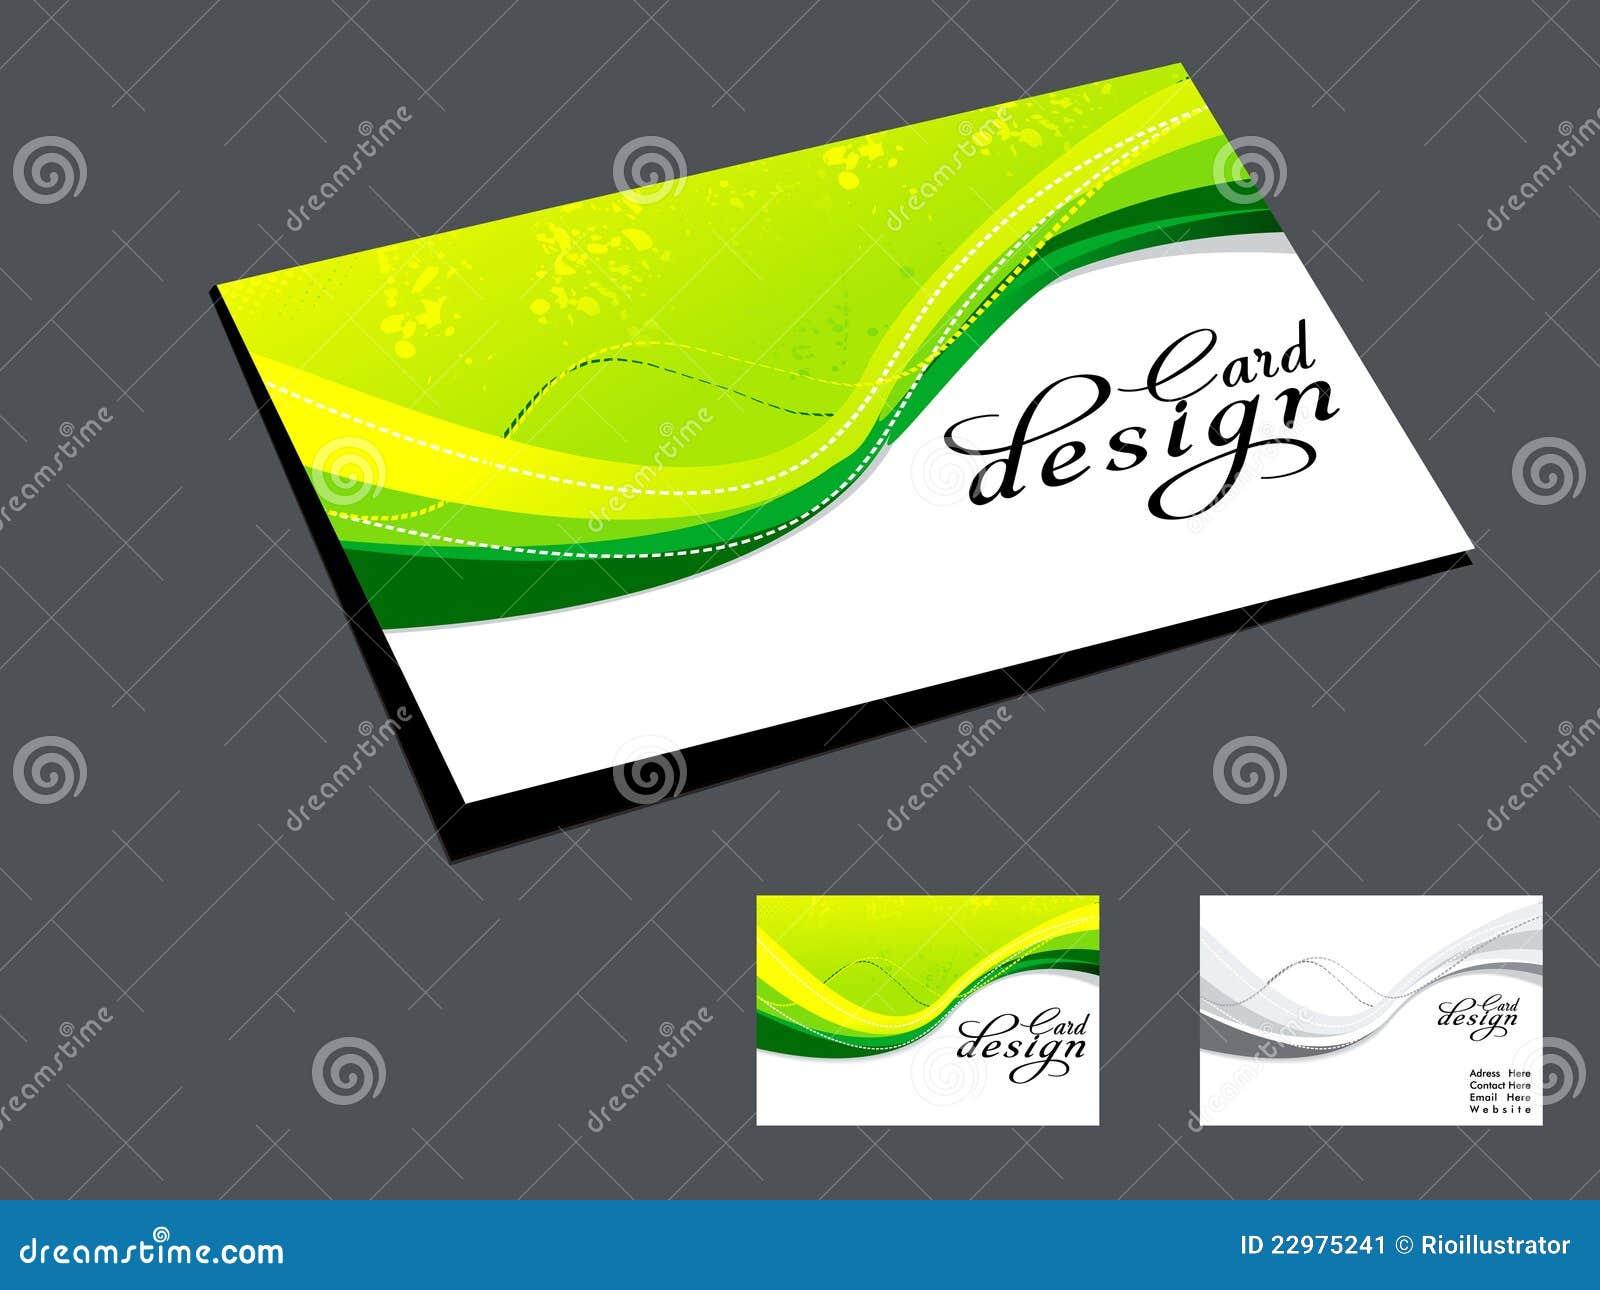 Green Business Cardsalexabusinesscardprinting Com